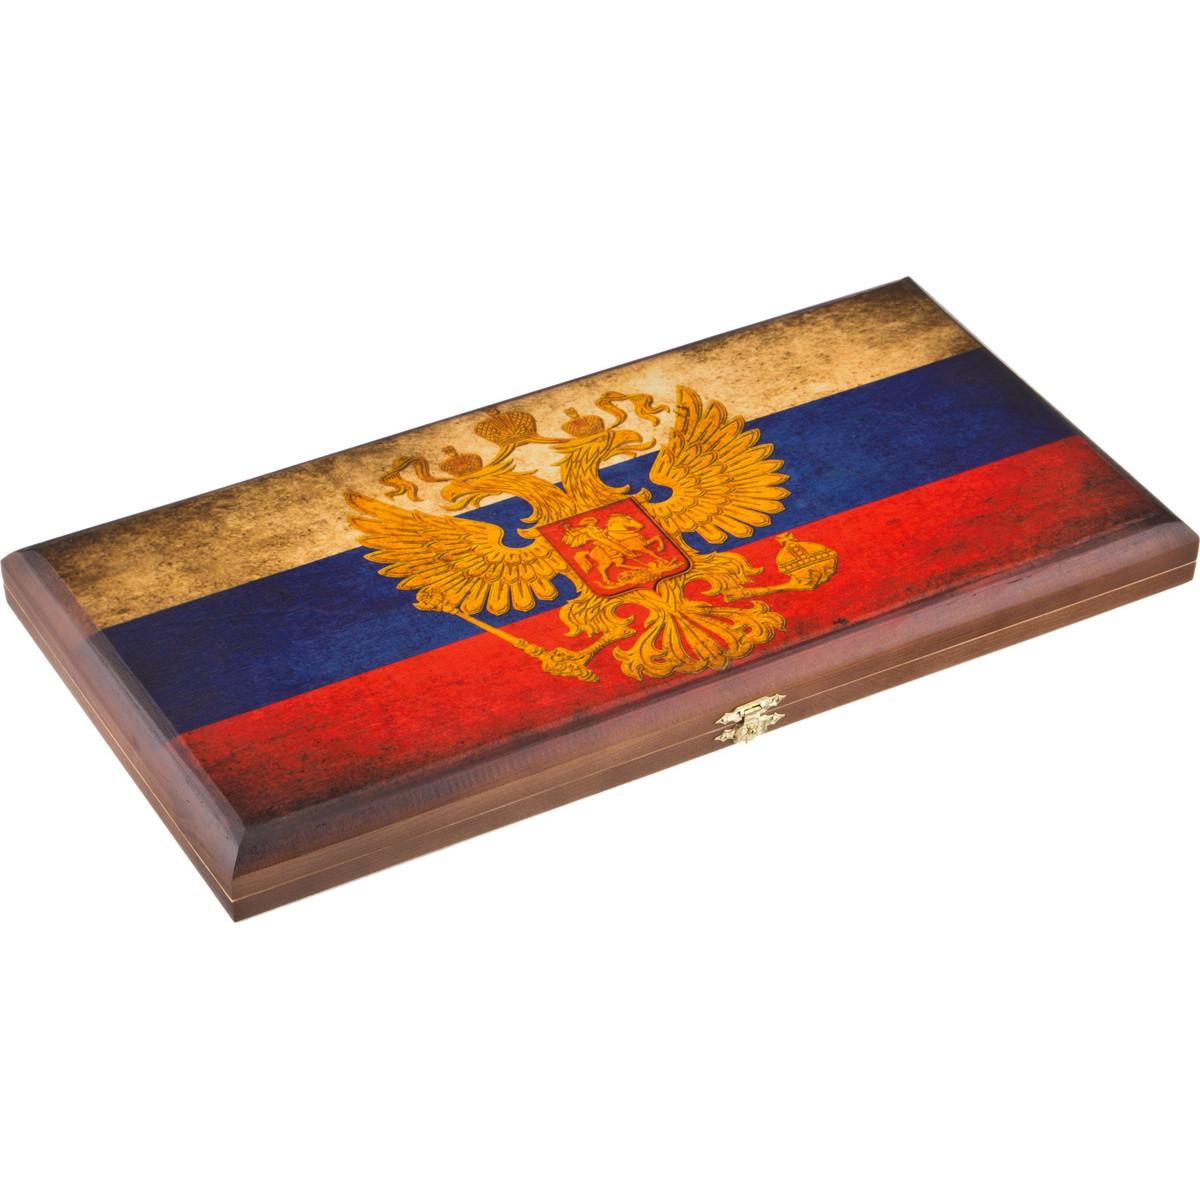 {} Arti-M Нарды Россия (50х50 см) брус 50х50 в набережных челнах